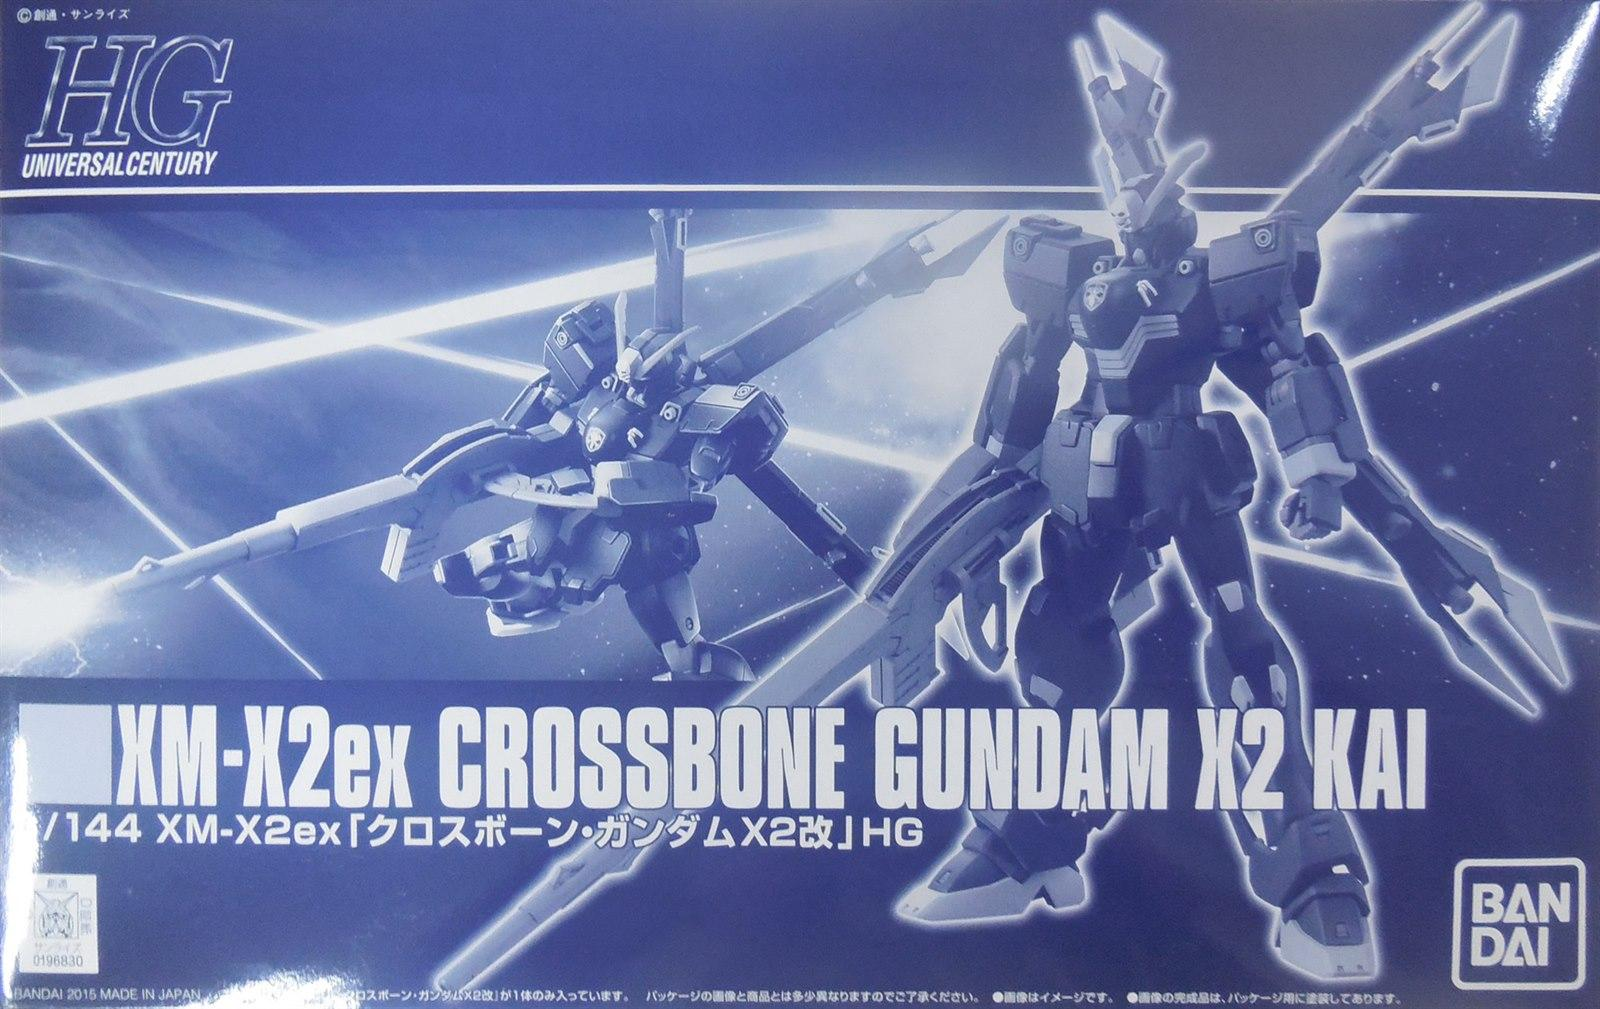 [PREMIUM BANDAI] HGUC Crossbone Gundam X-2 Kai